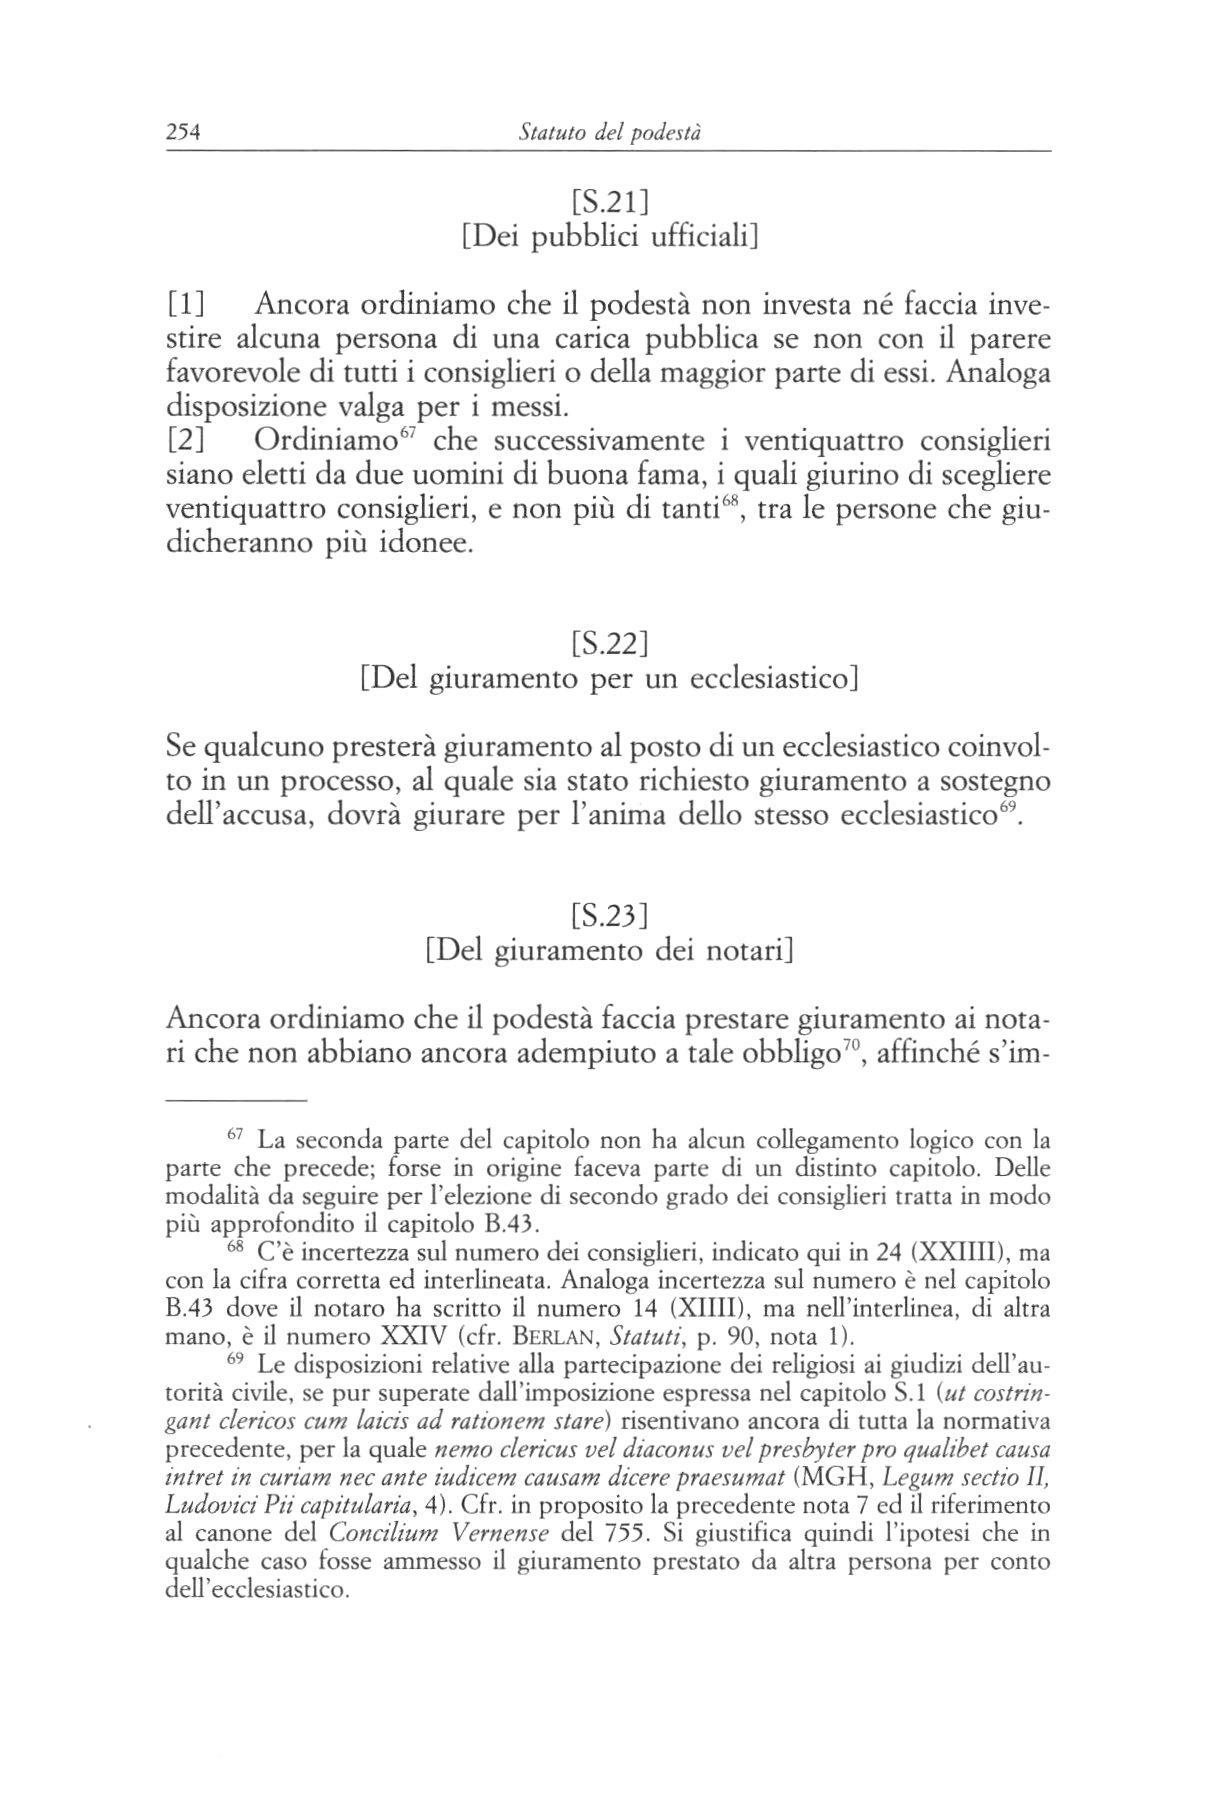 statuti pistoiesi del sec.XII 0254.jpg